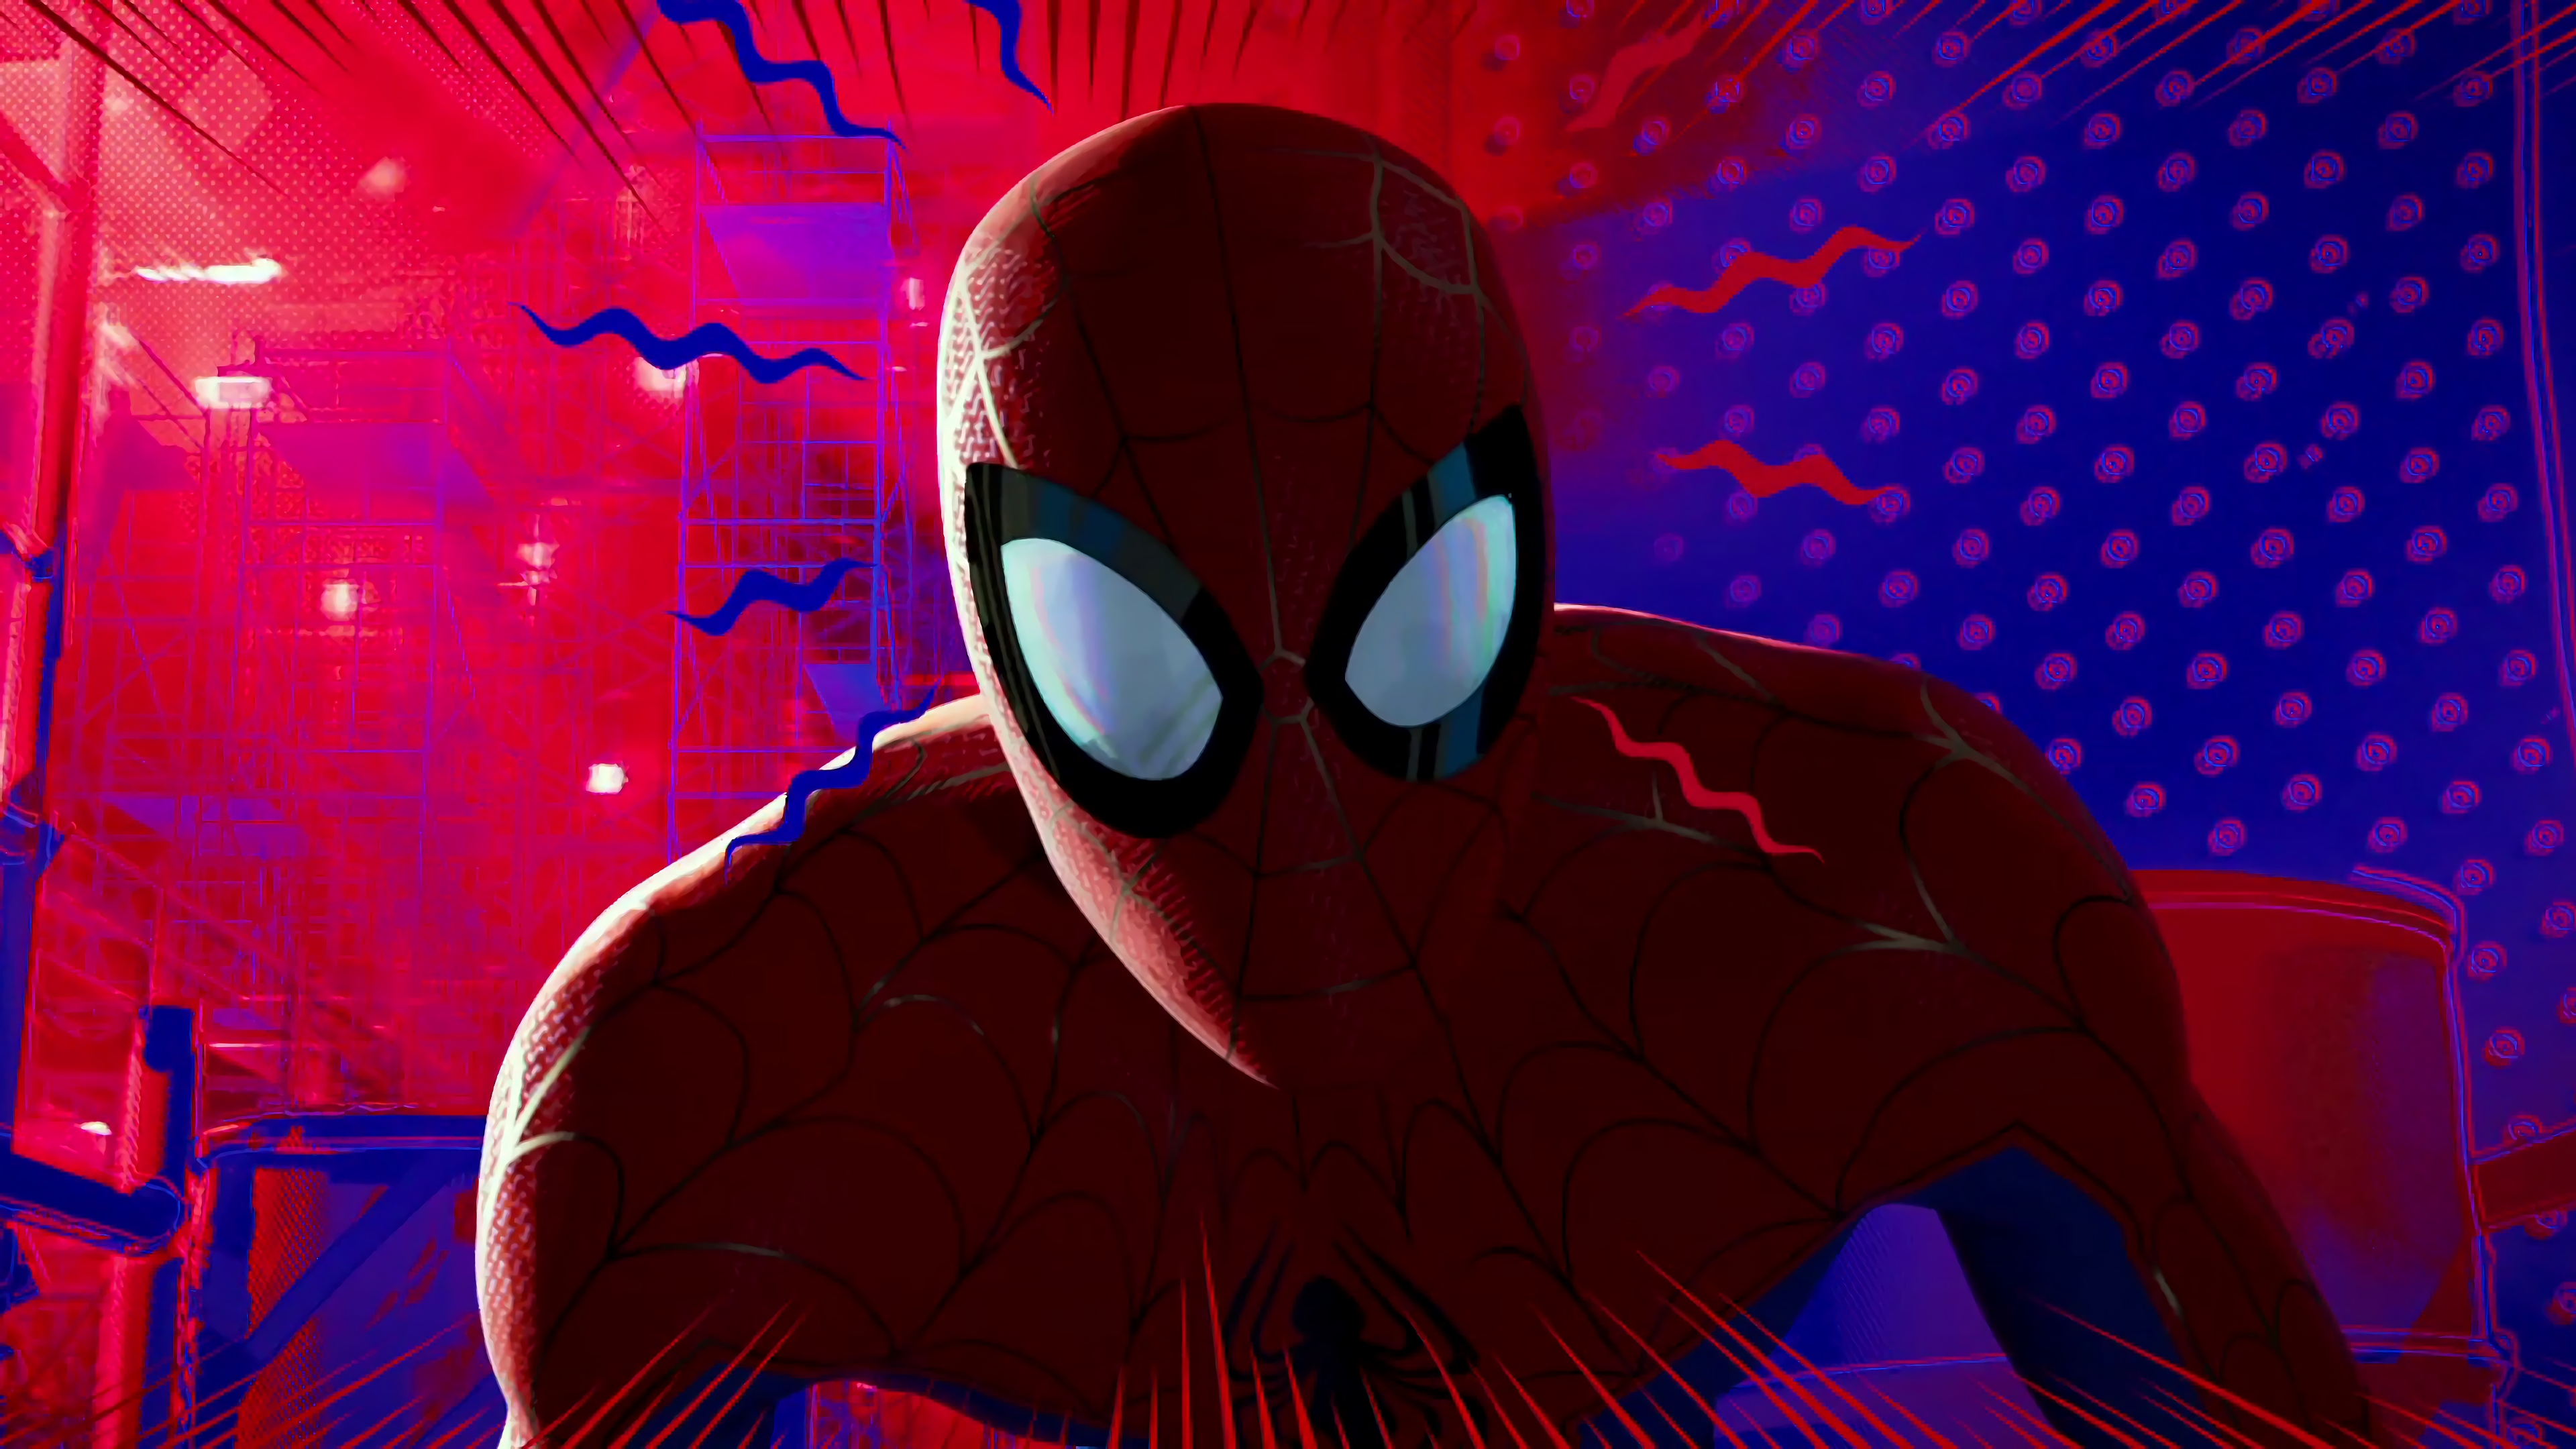 SpiderMan Into The Spider Verse 2018 Movie 4k, HD Movies